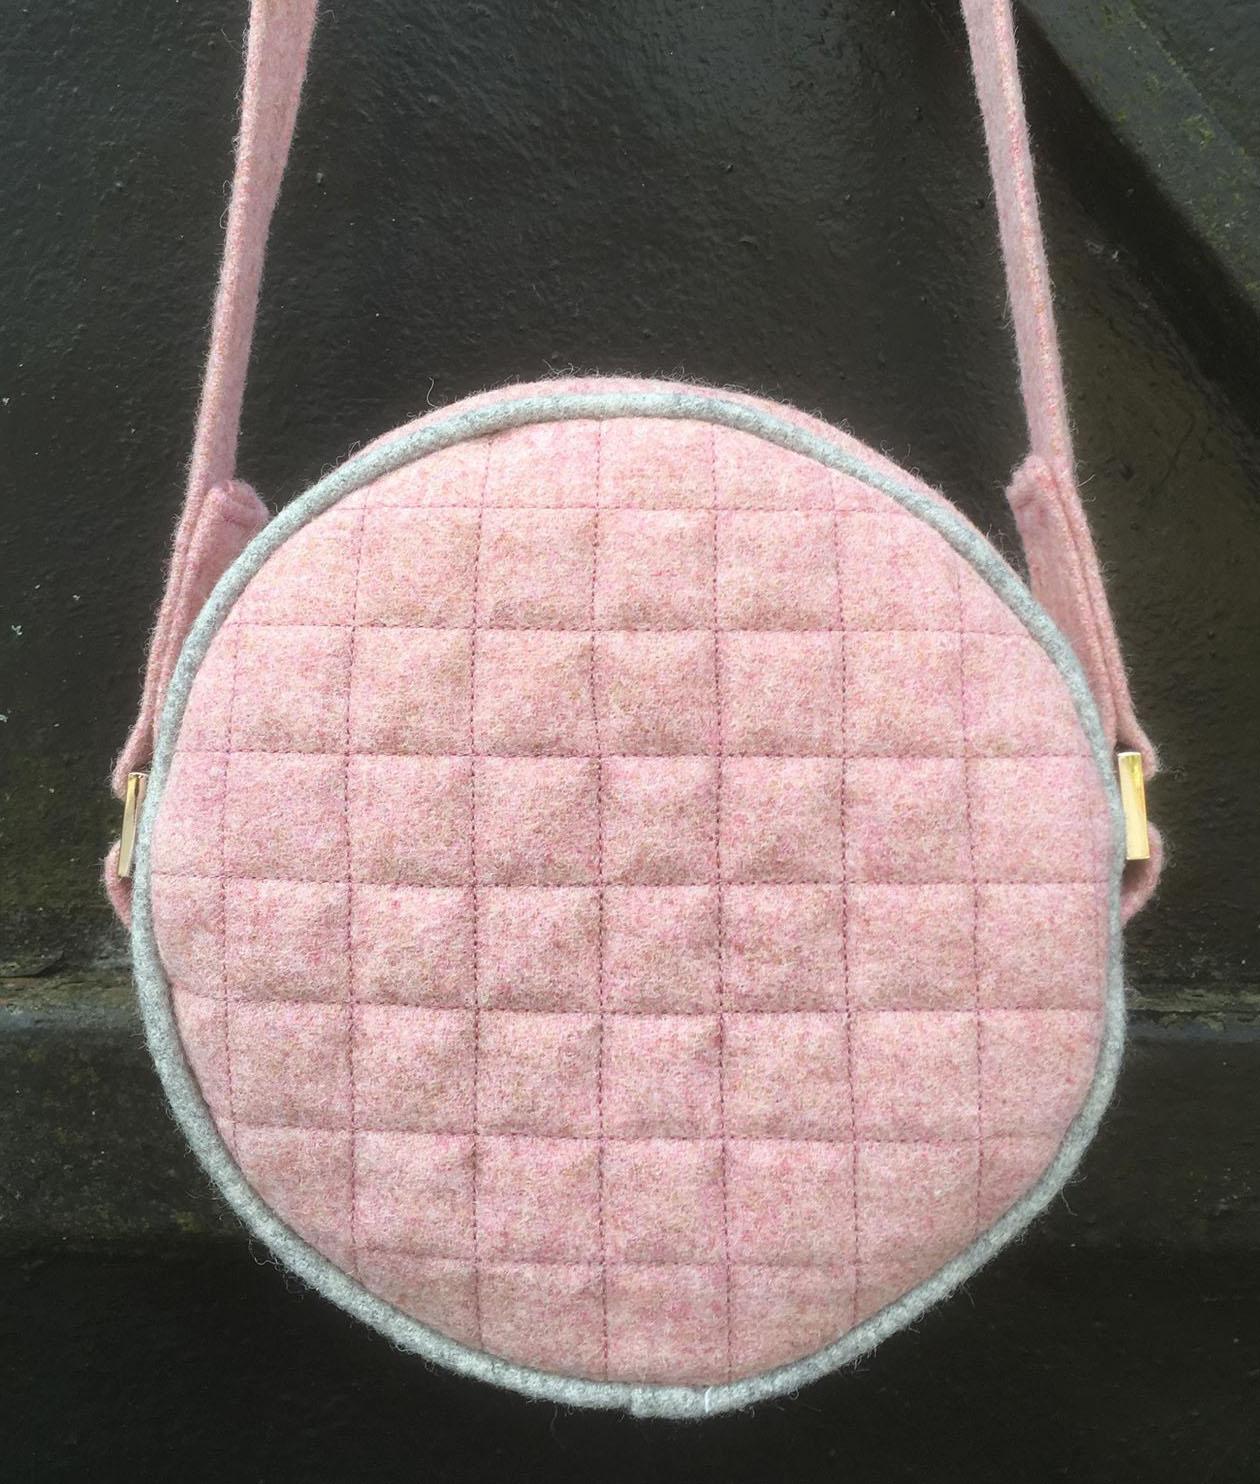 Rosa's bag kit